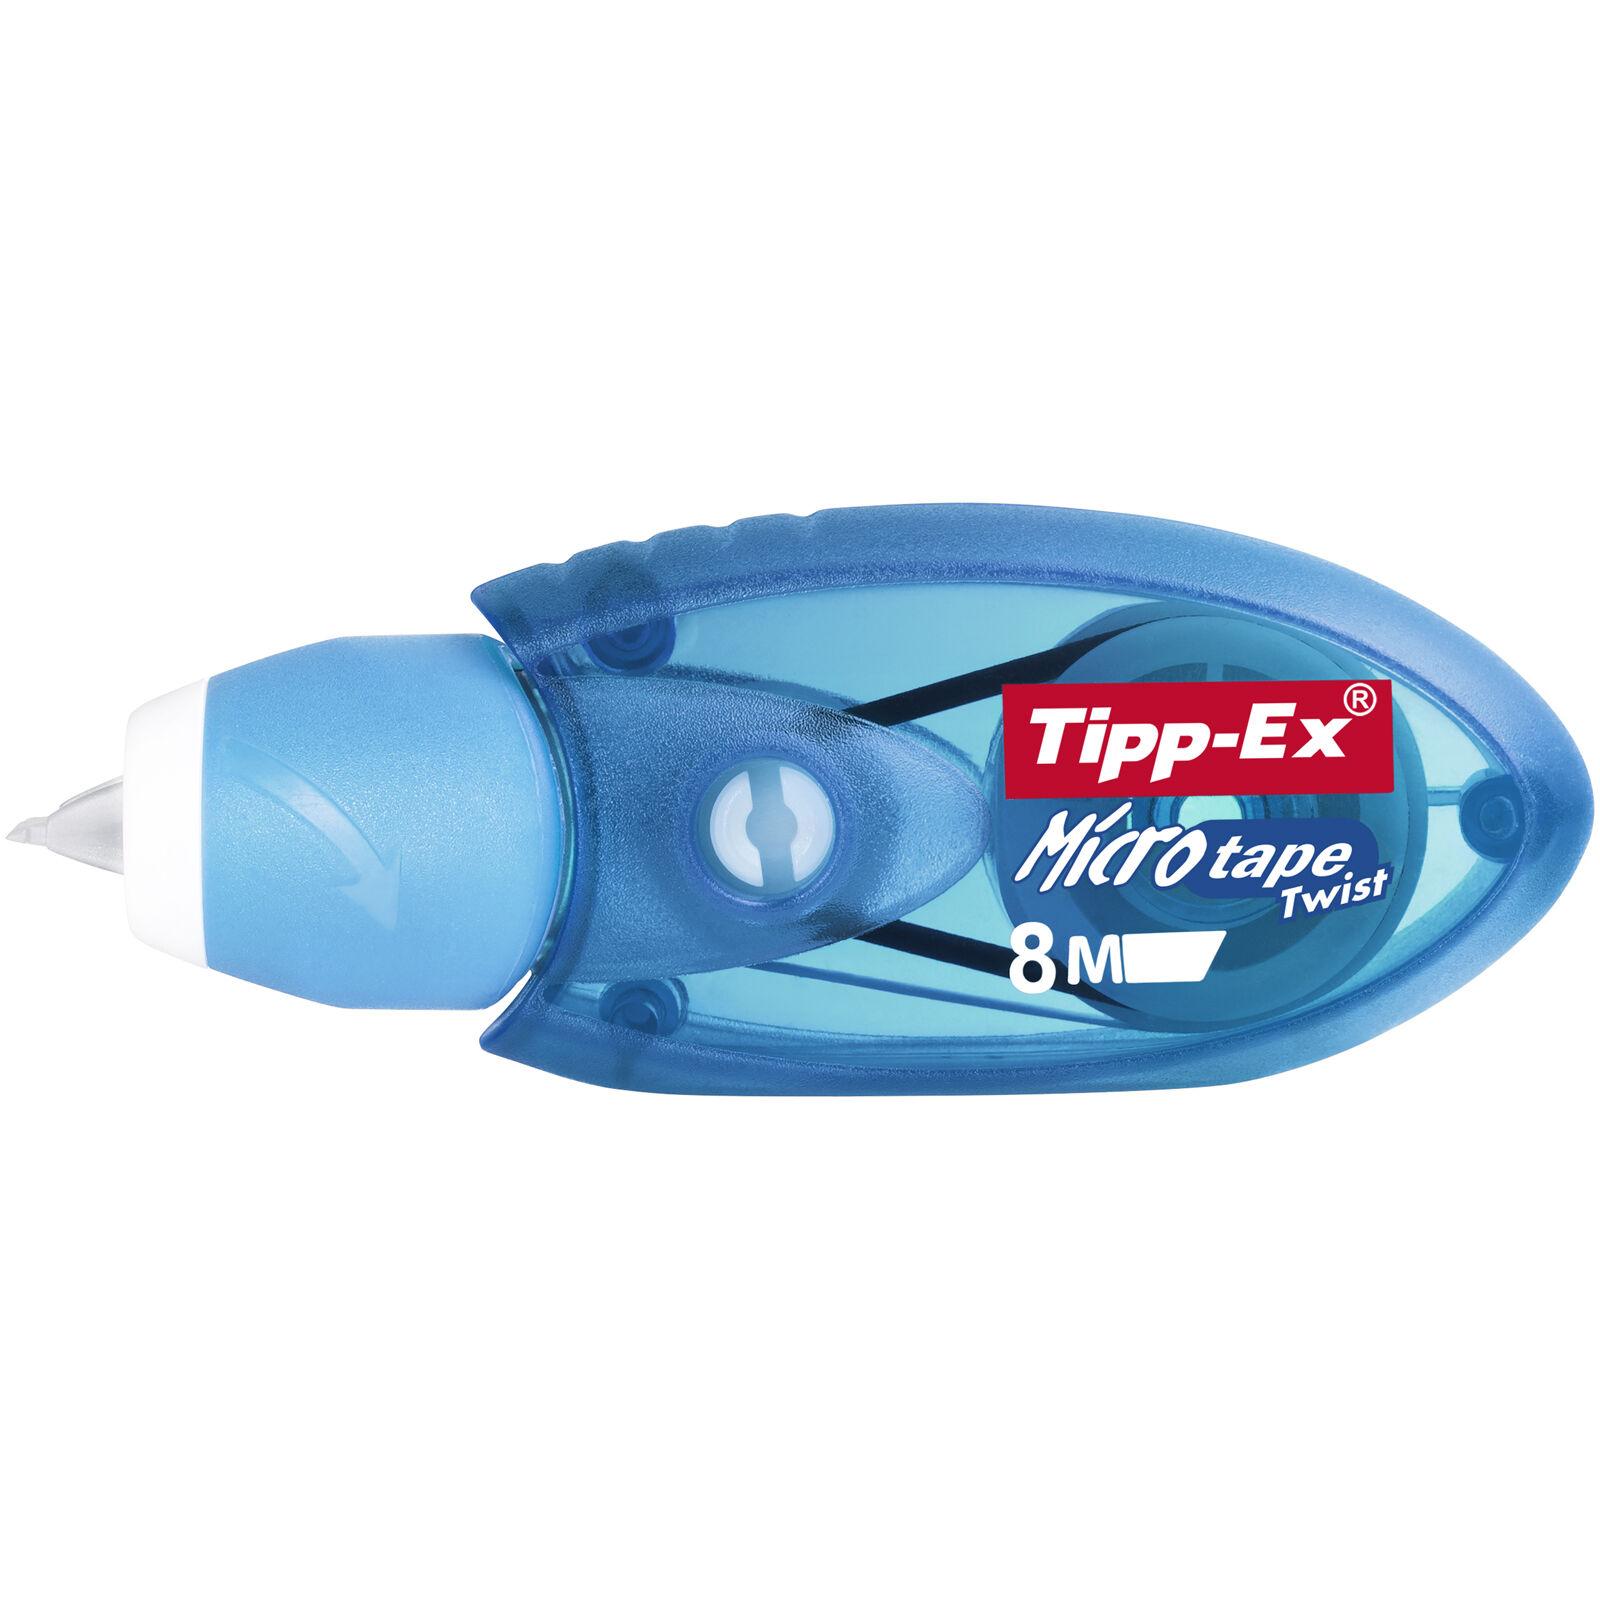 Tipp Ex - Correcteur - Microtape Twist